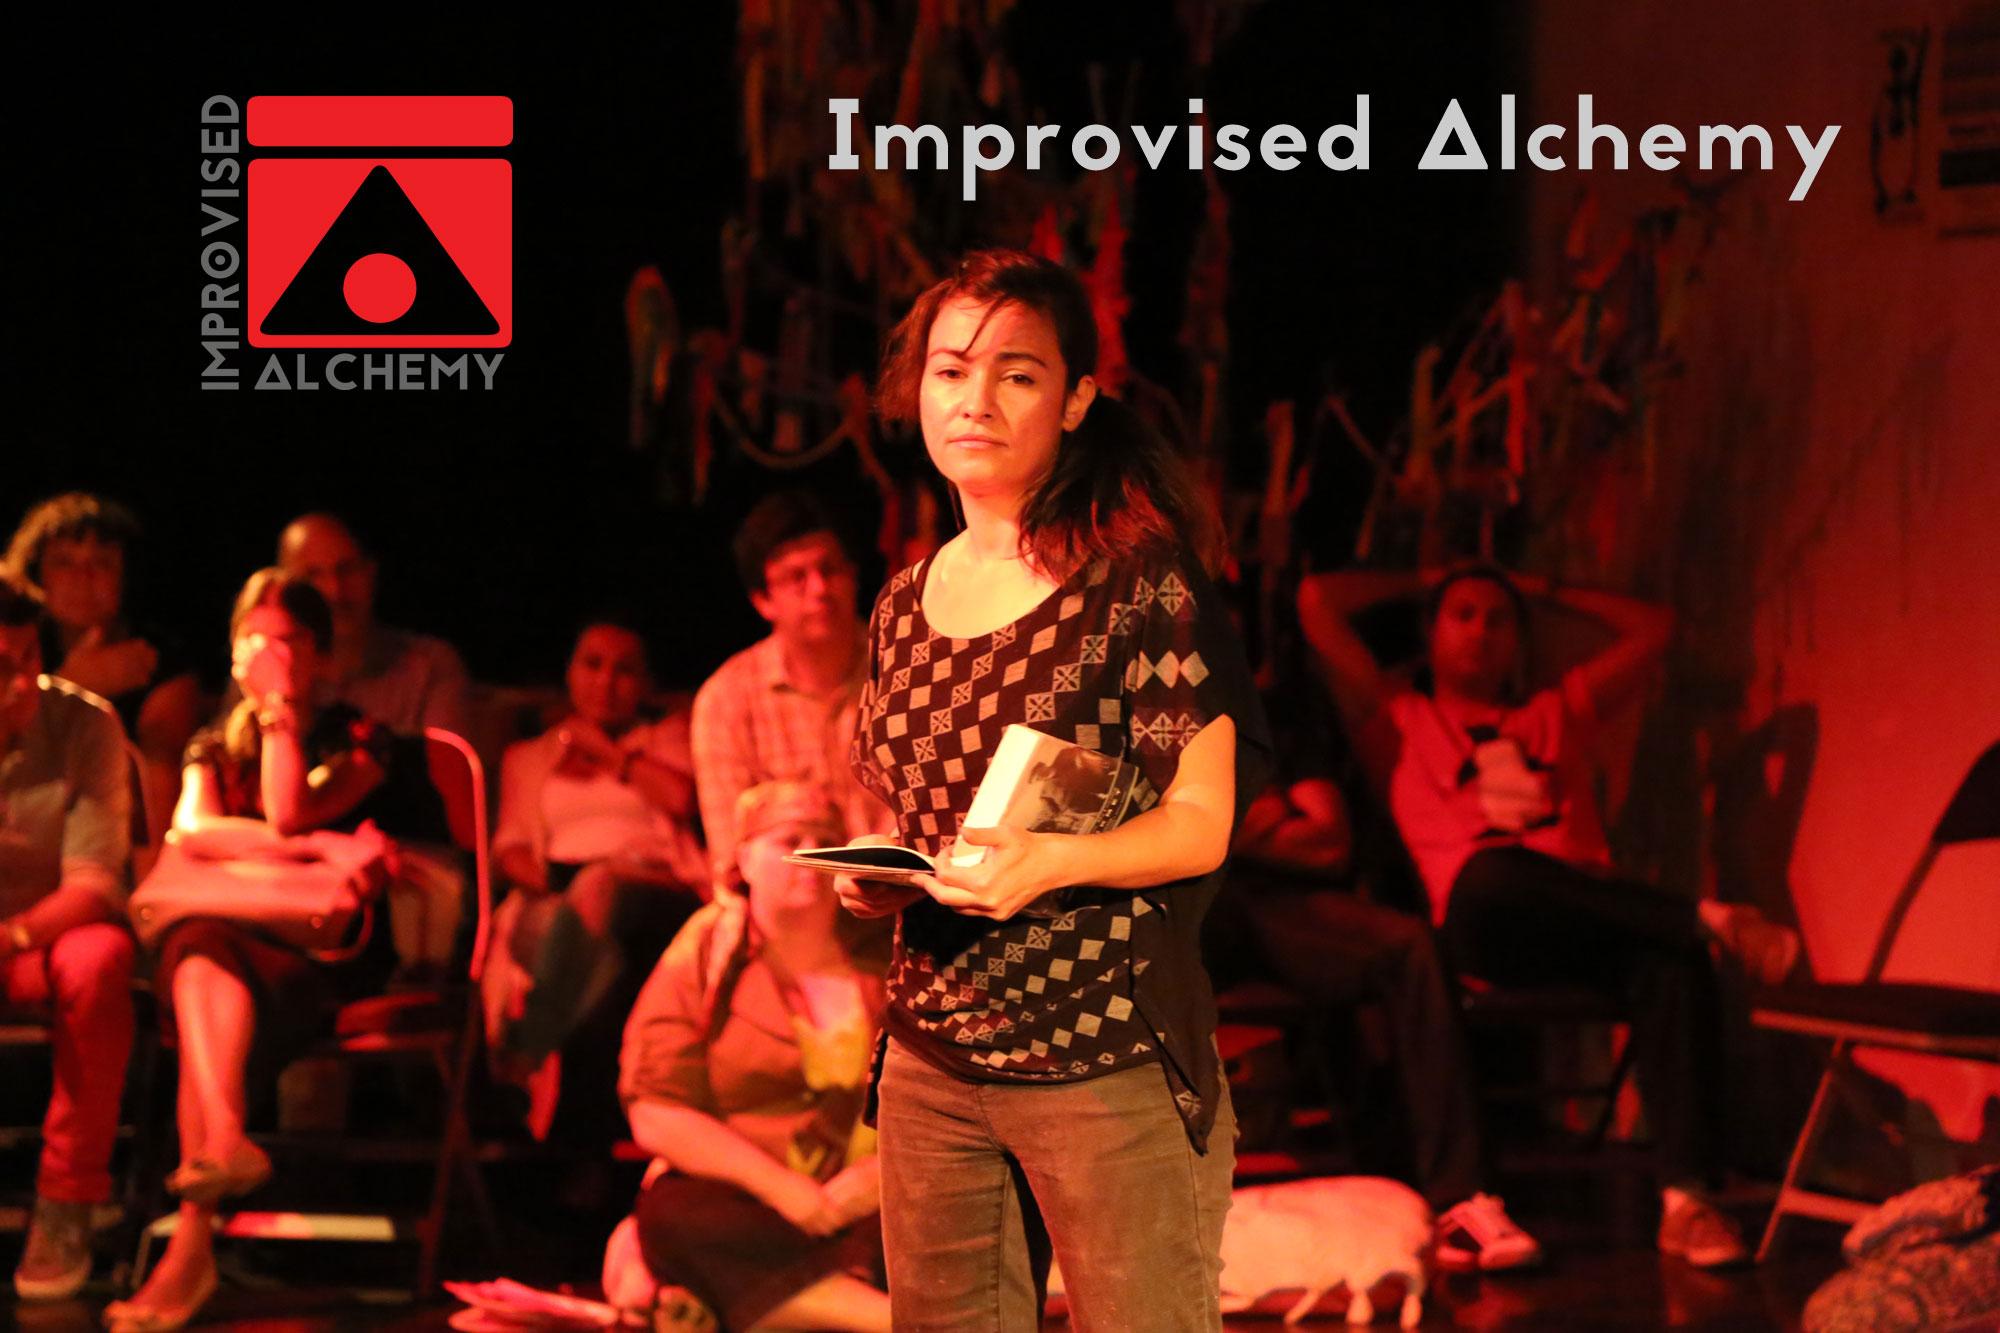 Improvised Alchemy transmedia performance collective